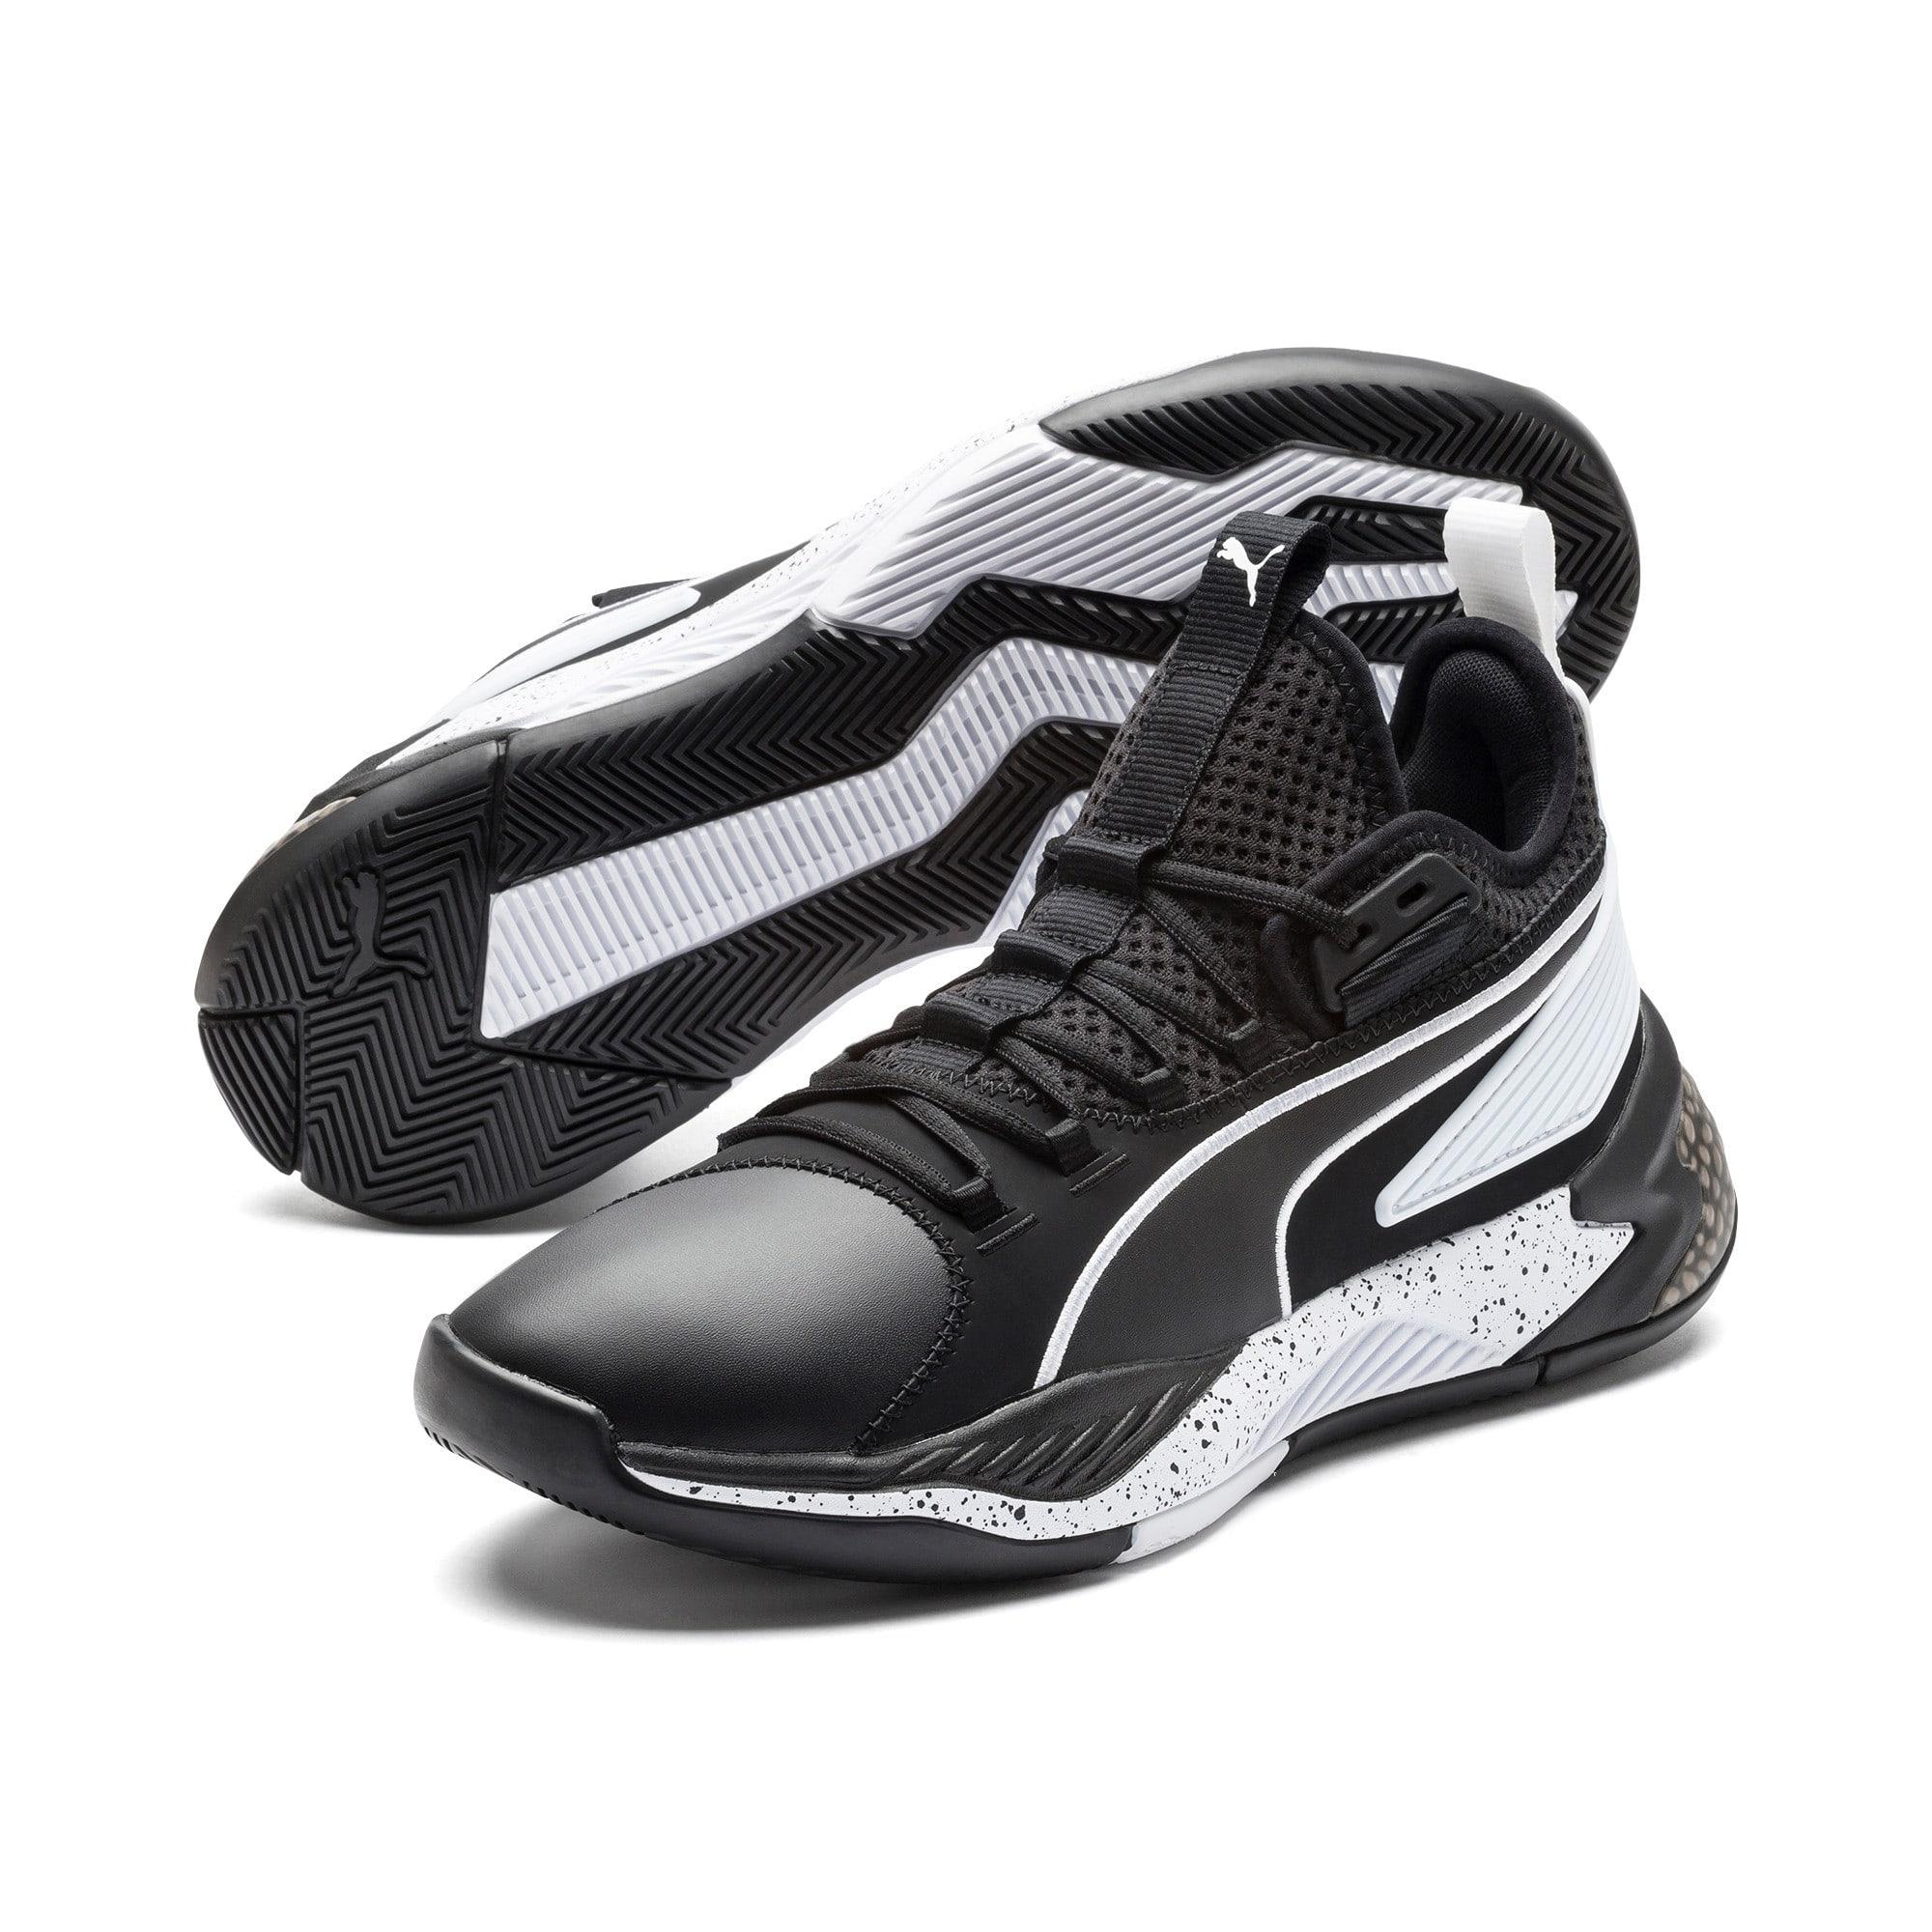 Thumbnail 2 of Uproar Core Basketball Shoes, Puma Black, medium